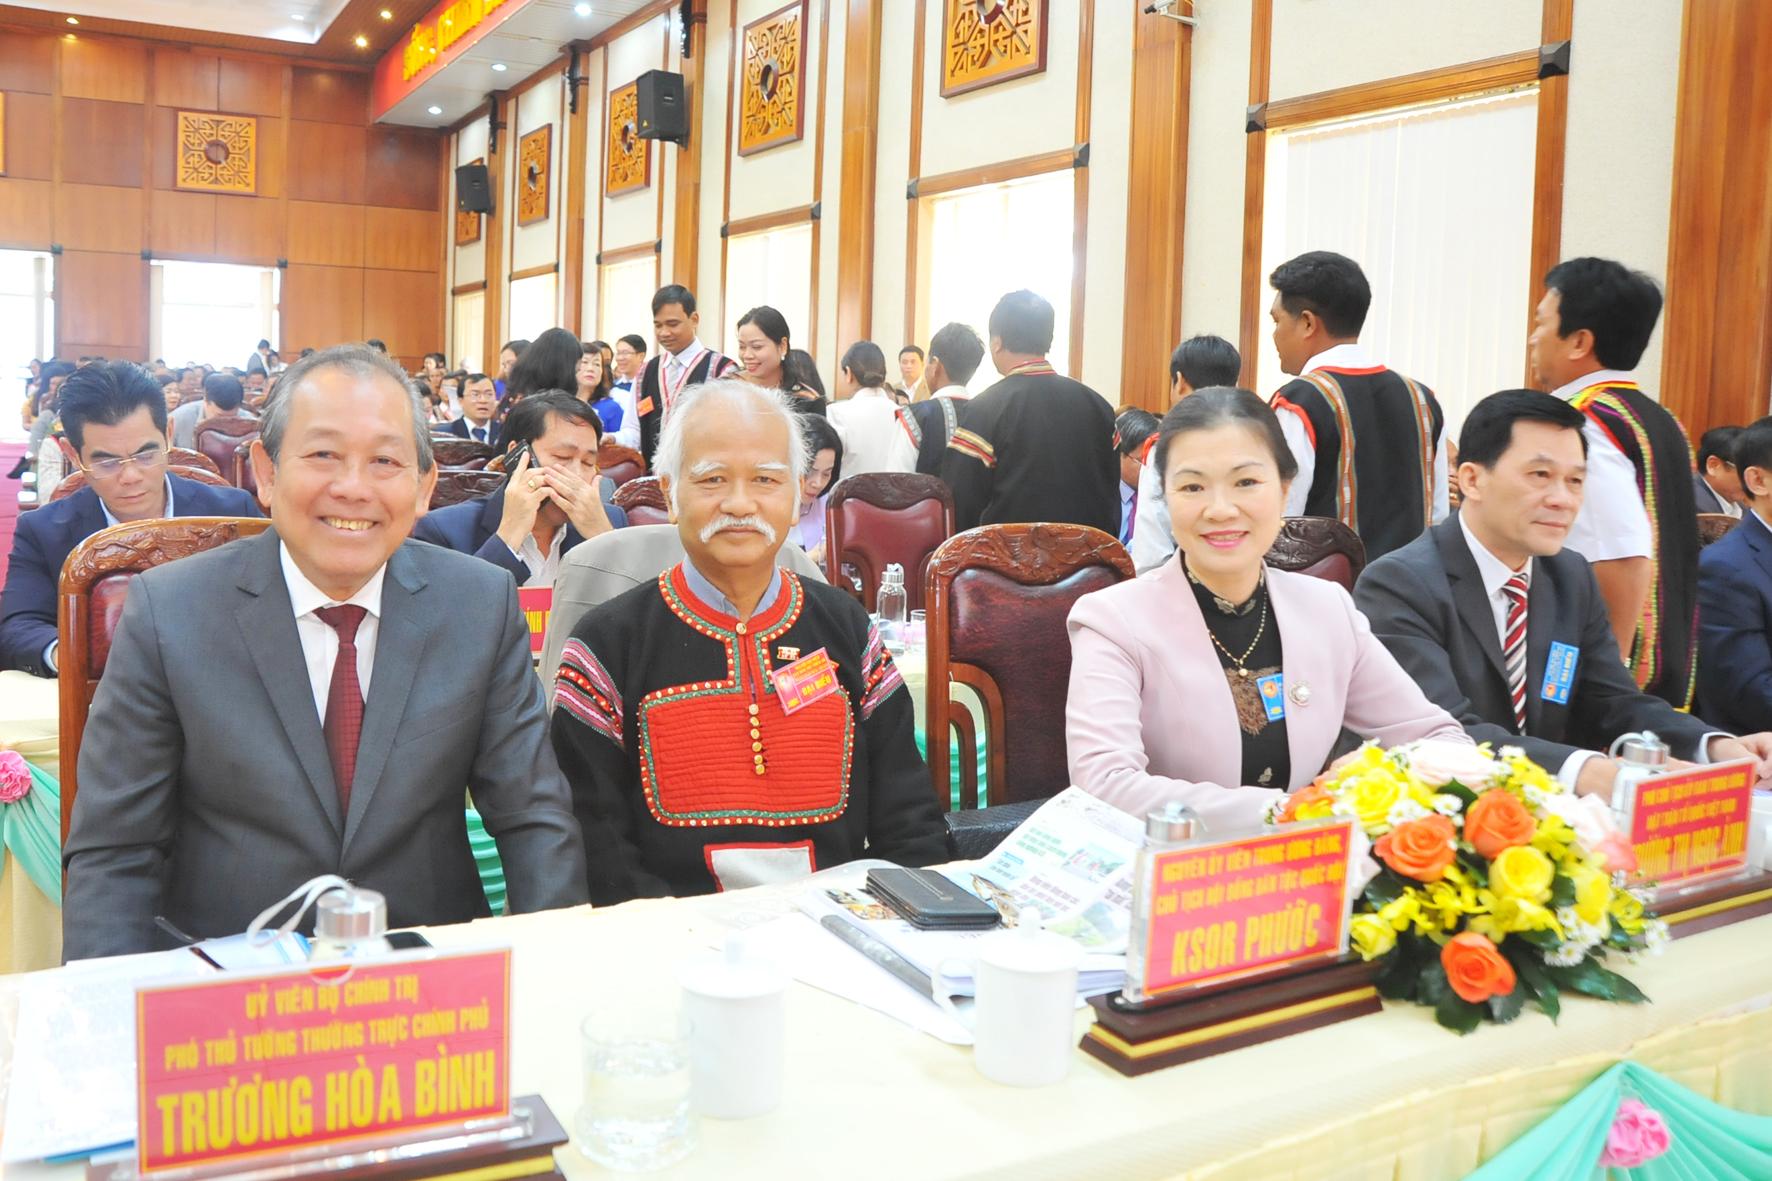 250 delegates attend Gia Lai Ethnic Minority Groups Congress